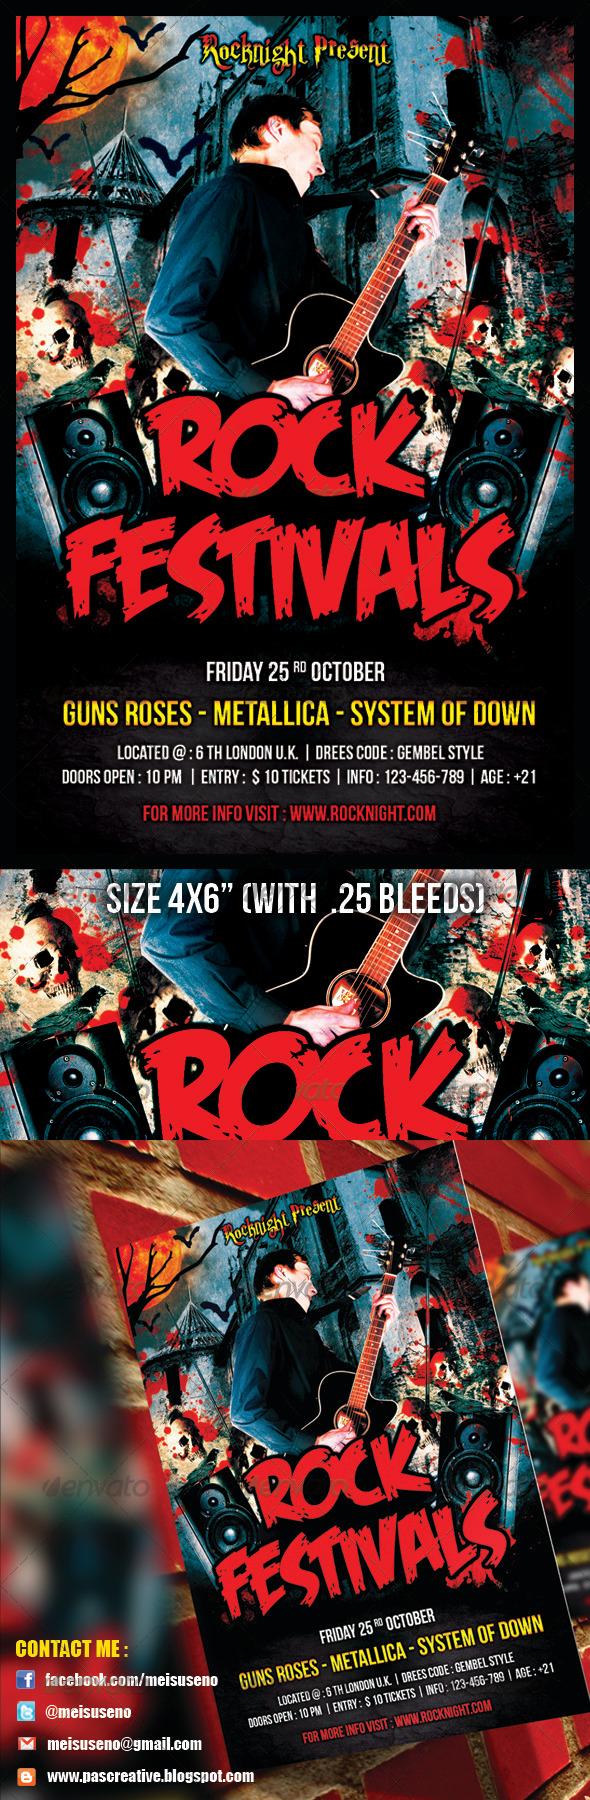 Rock Festivals Flyer Template - Events Flyers